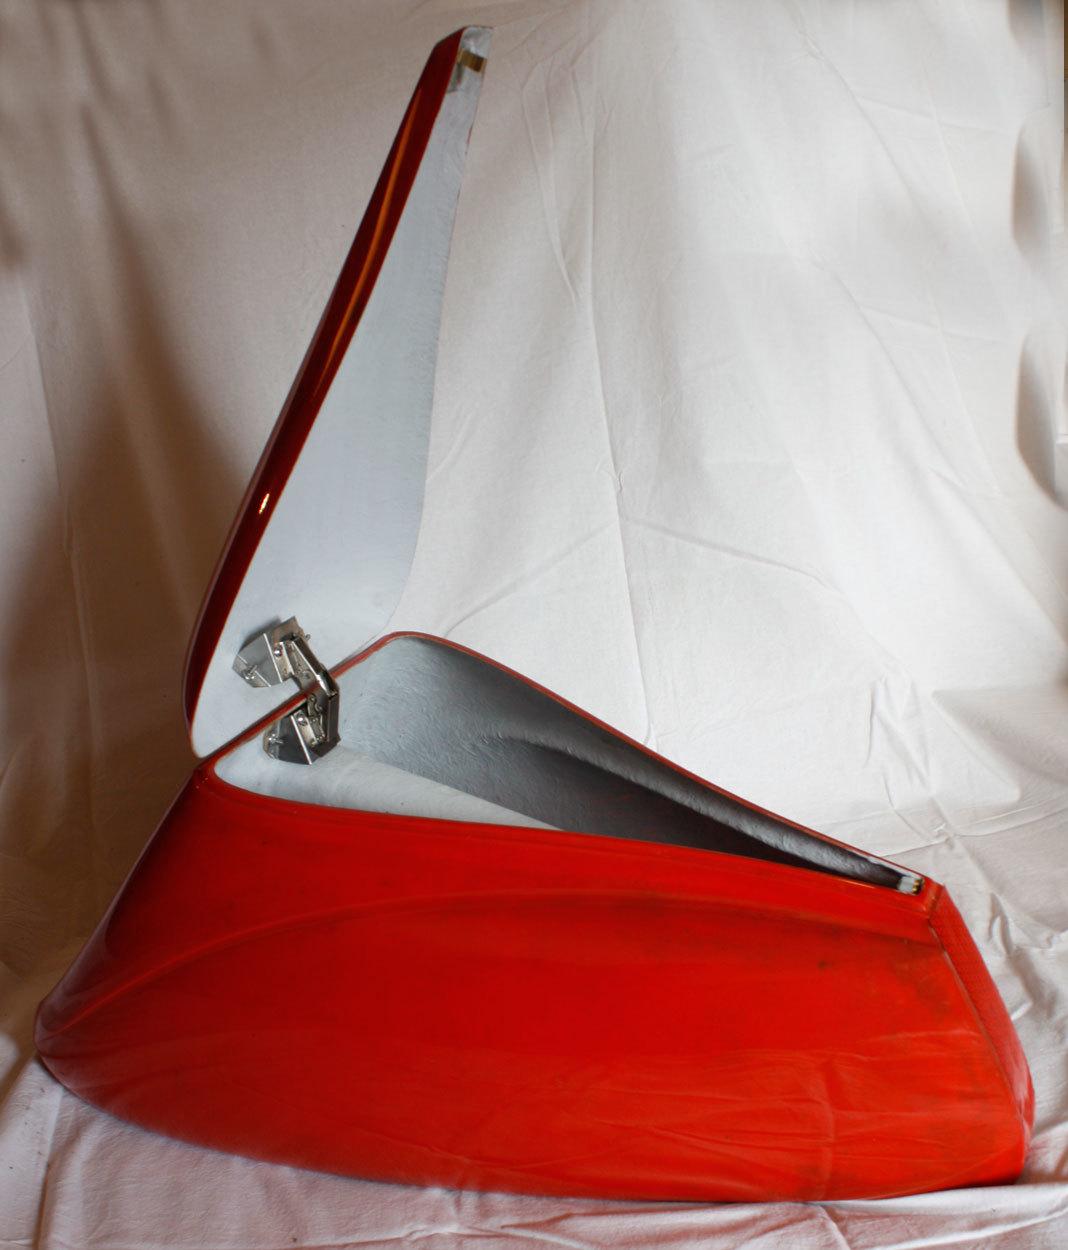 Tailbox Dolphin Fiberglass - Shipping Cost FREE!